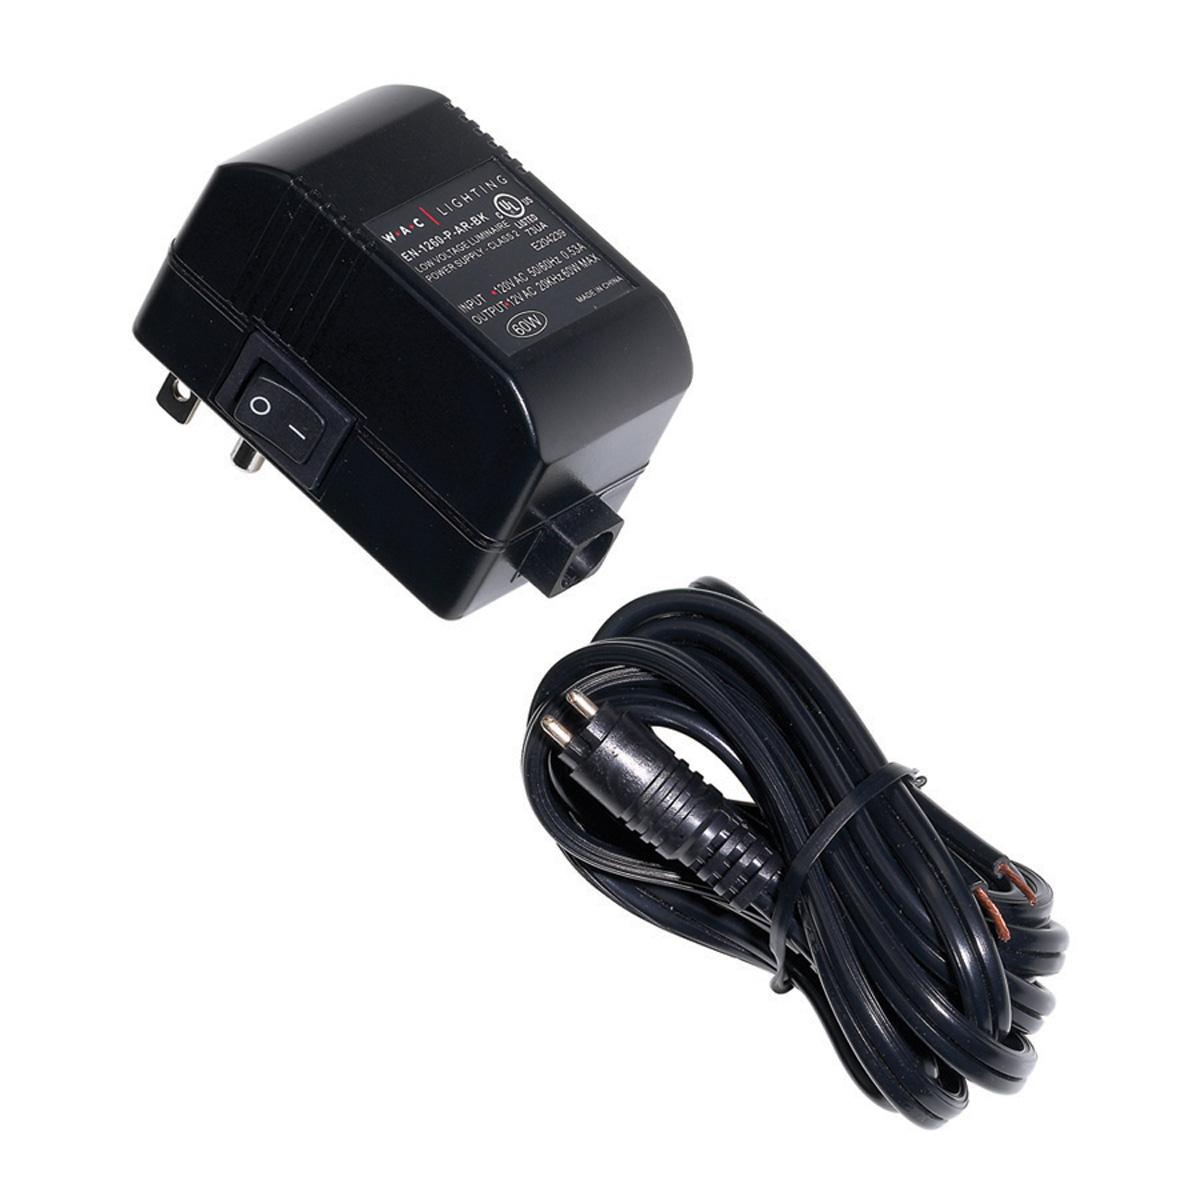 120v-12v-60w-plug-in-electronic-transformers